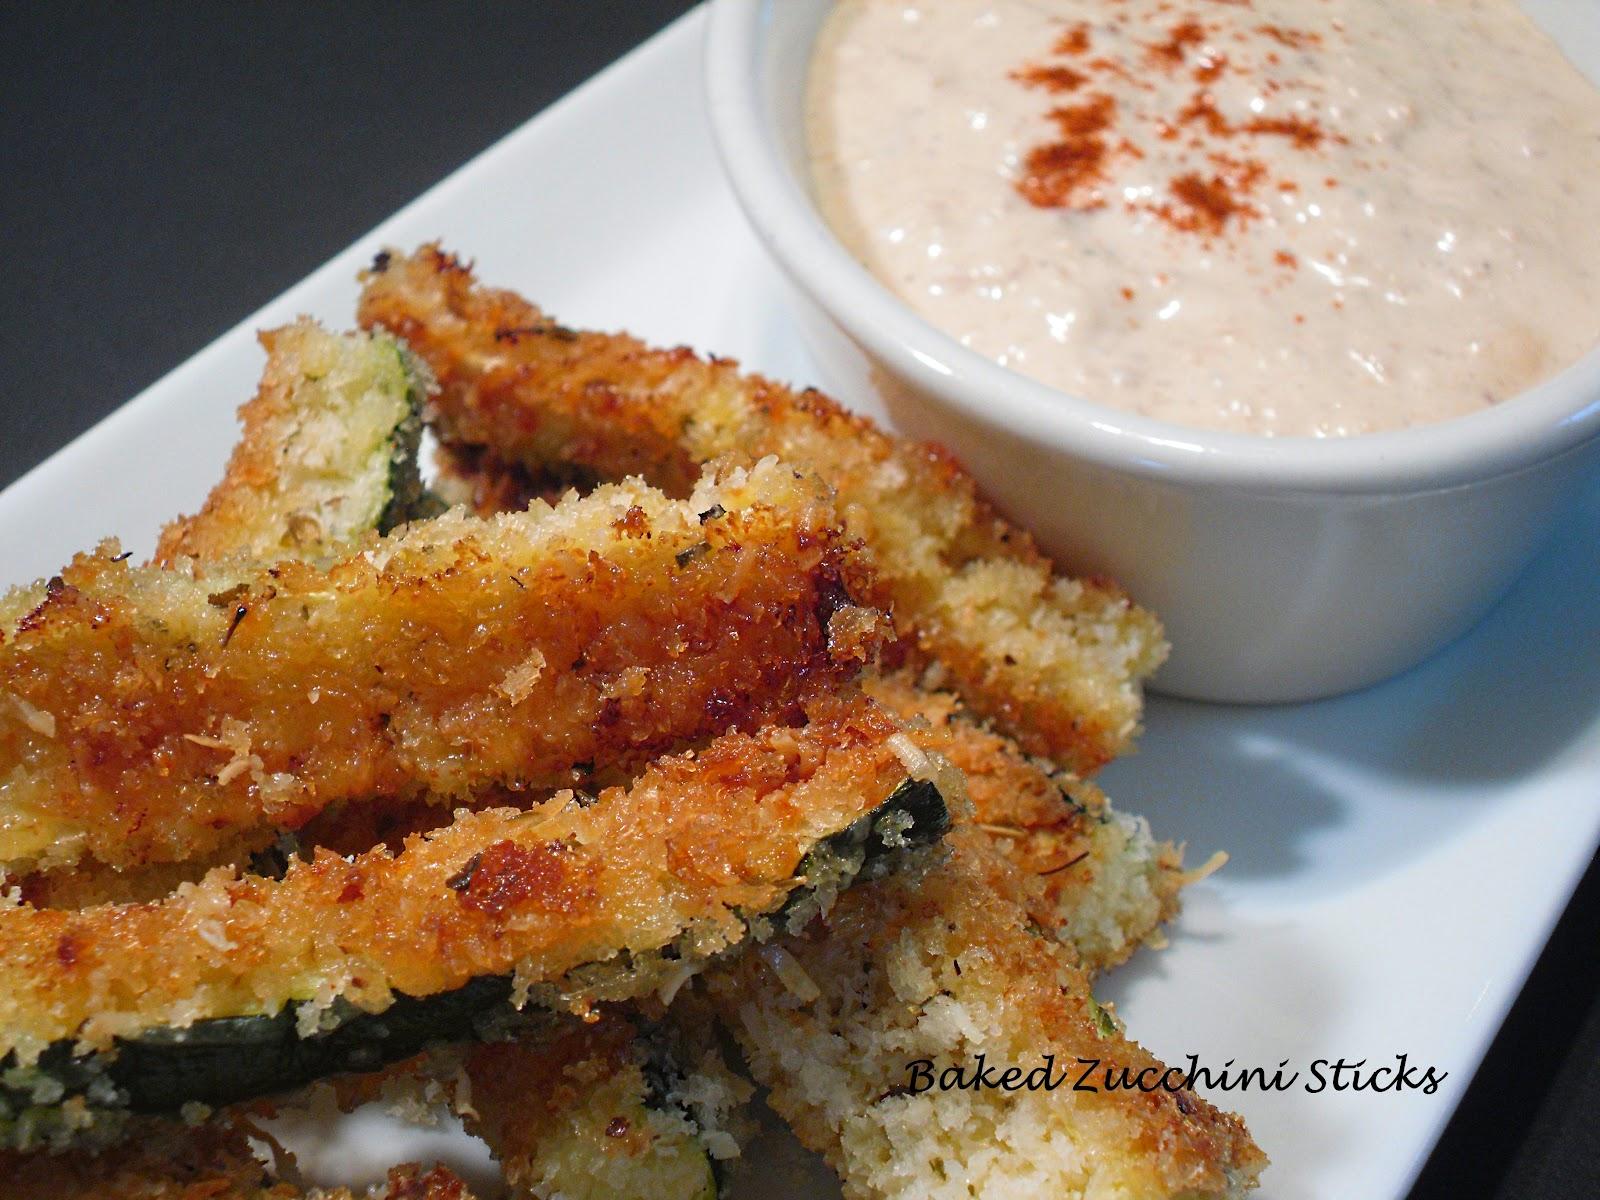 Baked Eggplant Sticks Recipes — Dishmaps